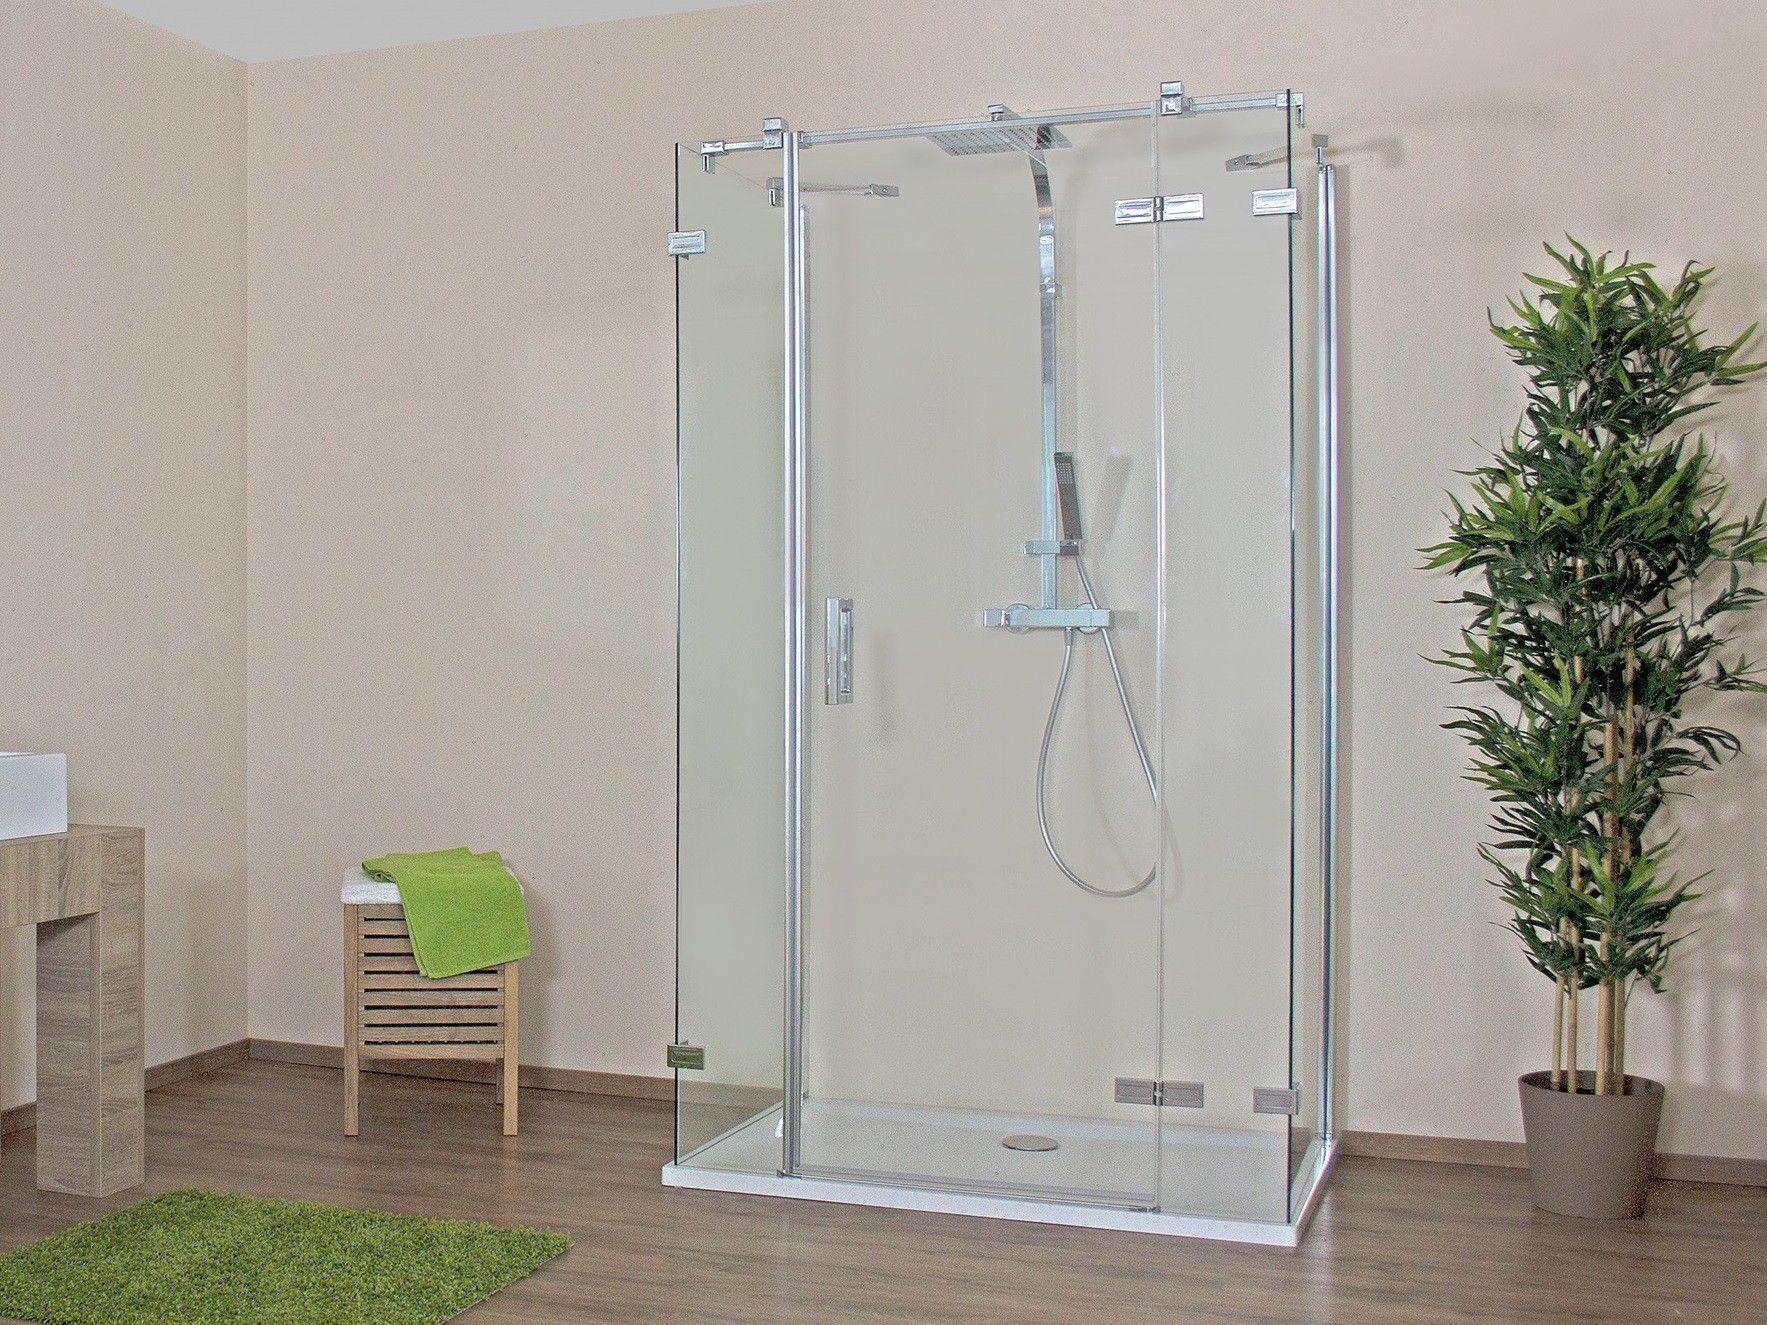 duschkabine u form 100 x 100 x 220 cm dusche u kabine pinterest duschkabine. Black Bedroom Furniture Sets. Home Design Ideas